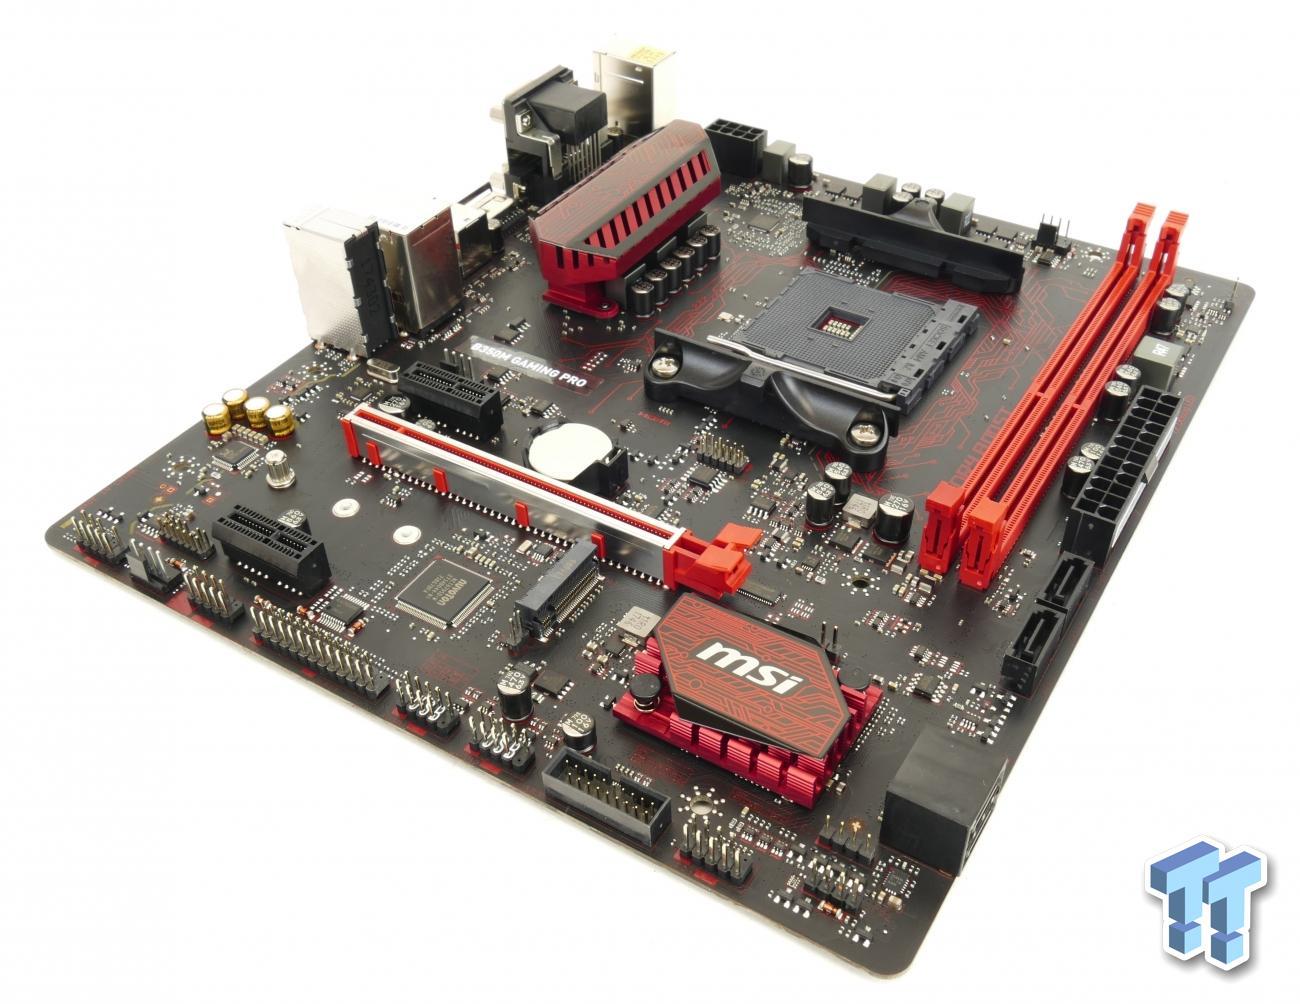 MSI B350M Gaming Pro (AMD B350) Motherboard Review